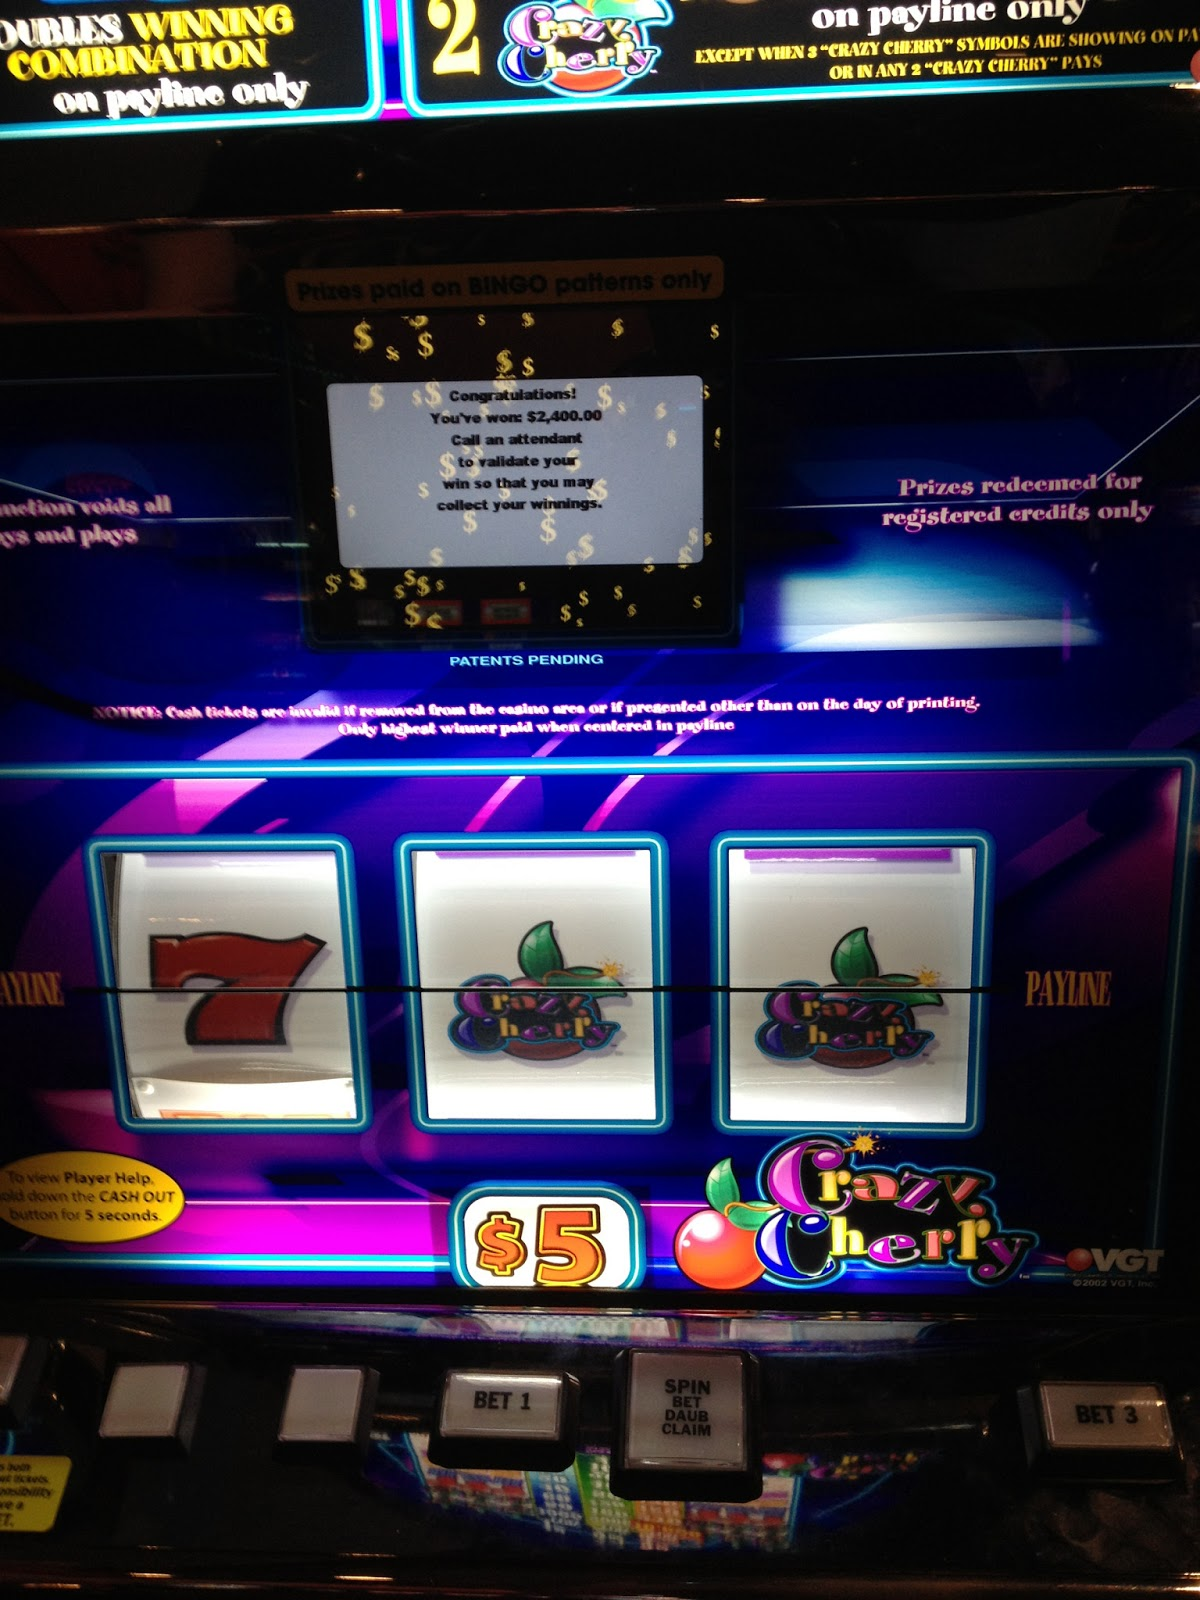 vgt slot machine